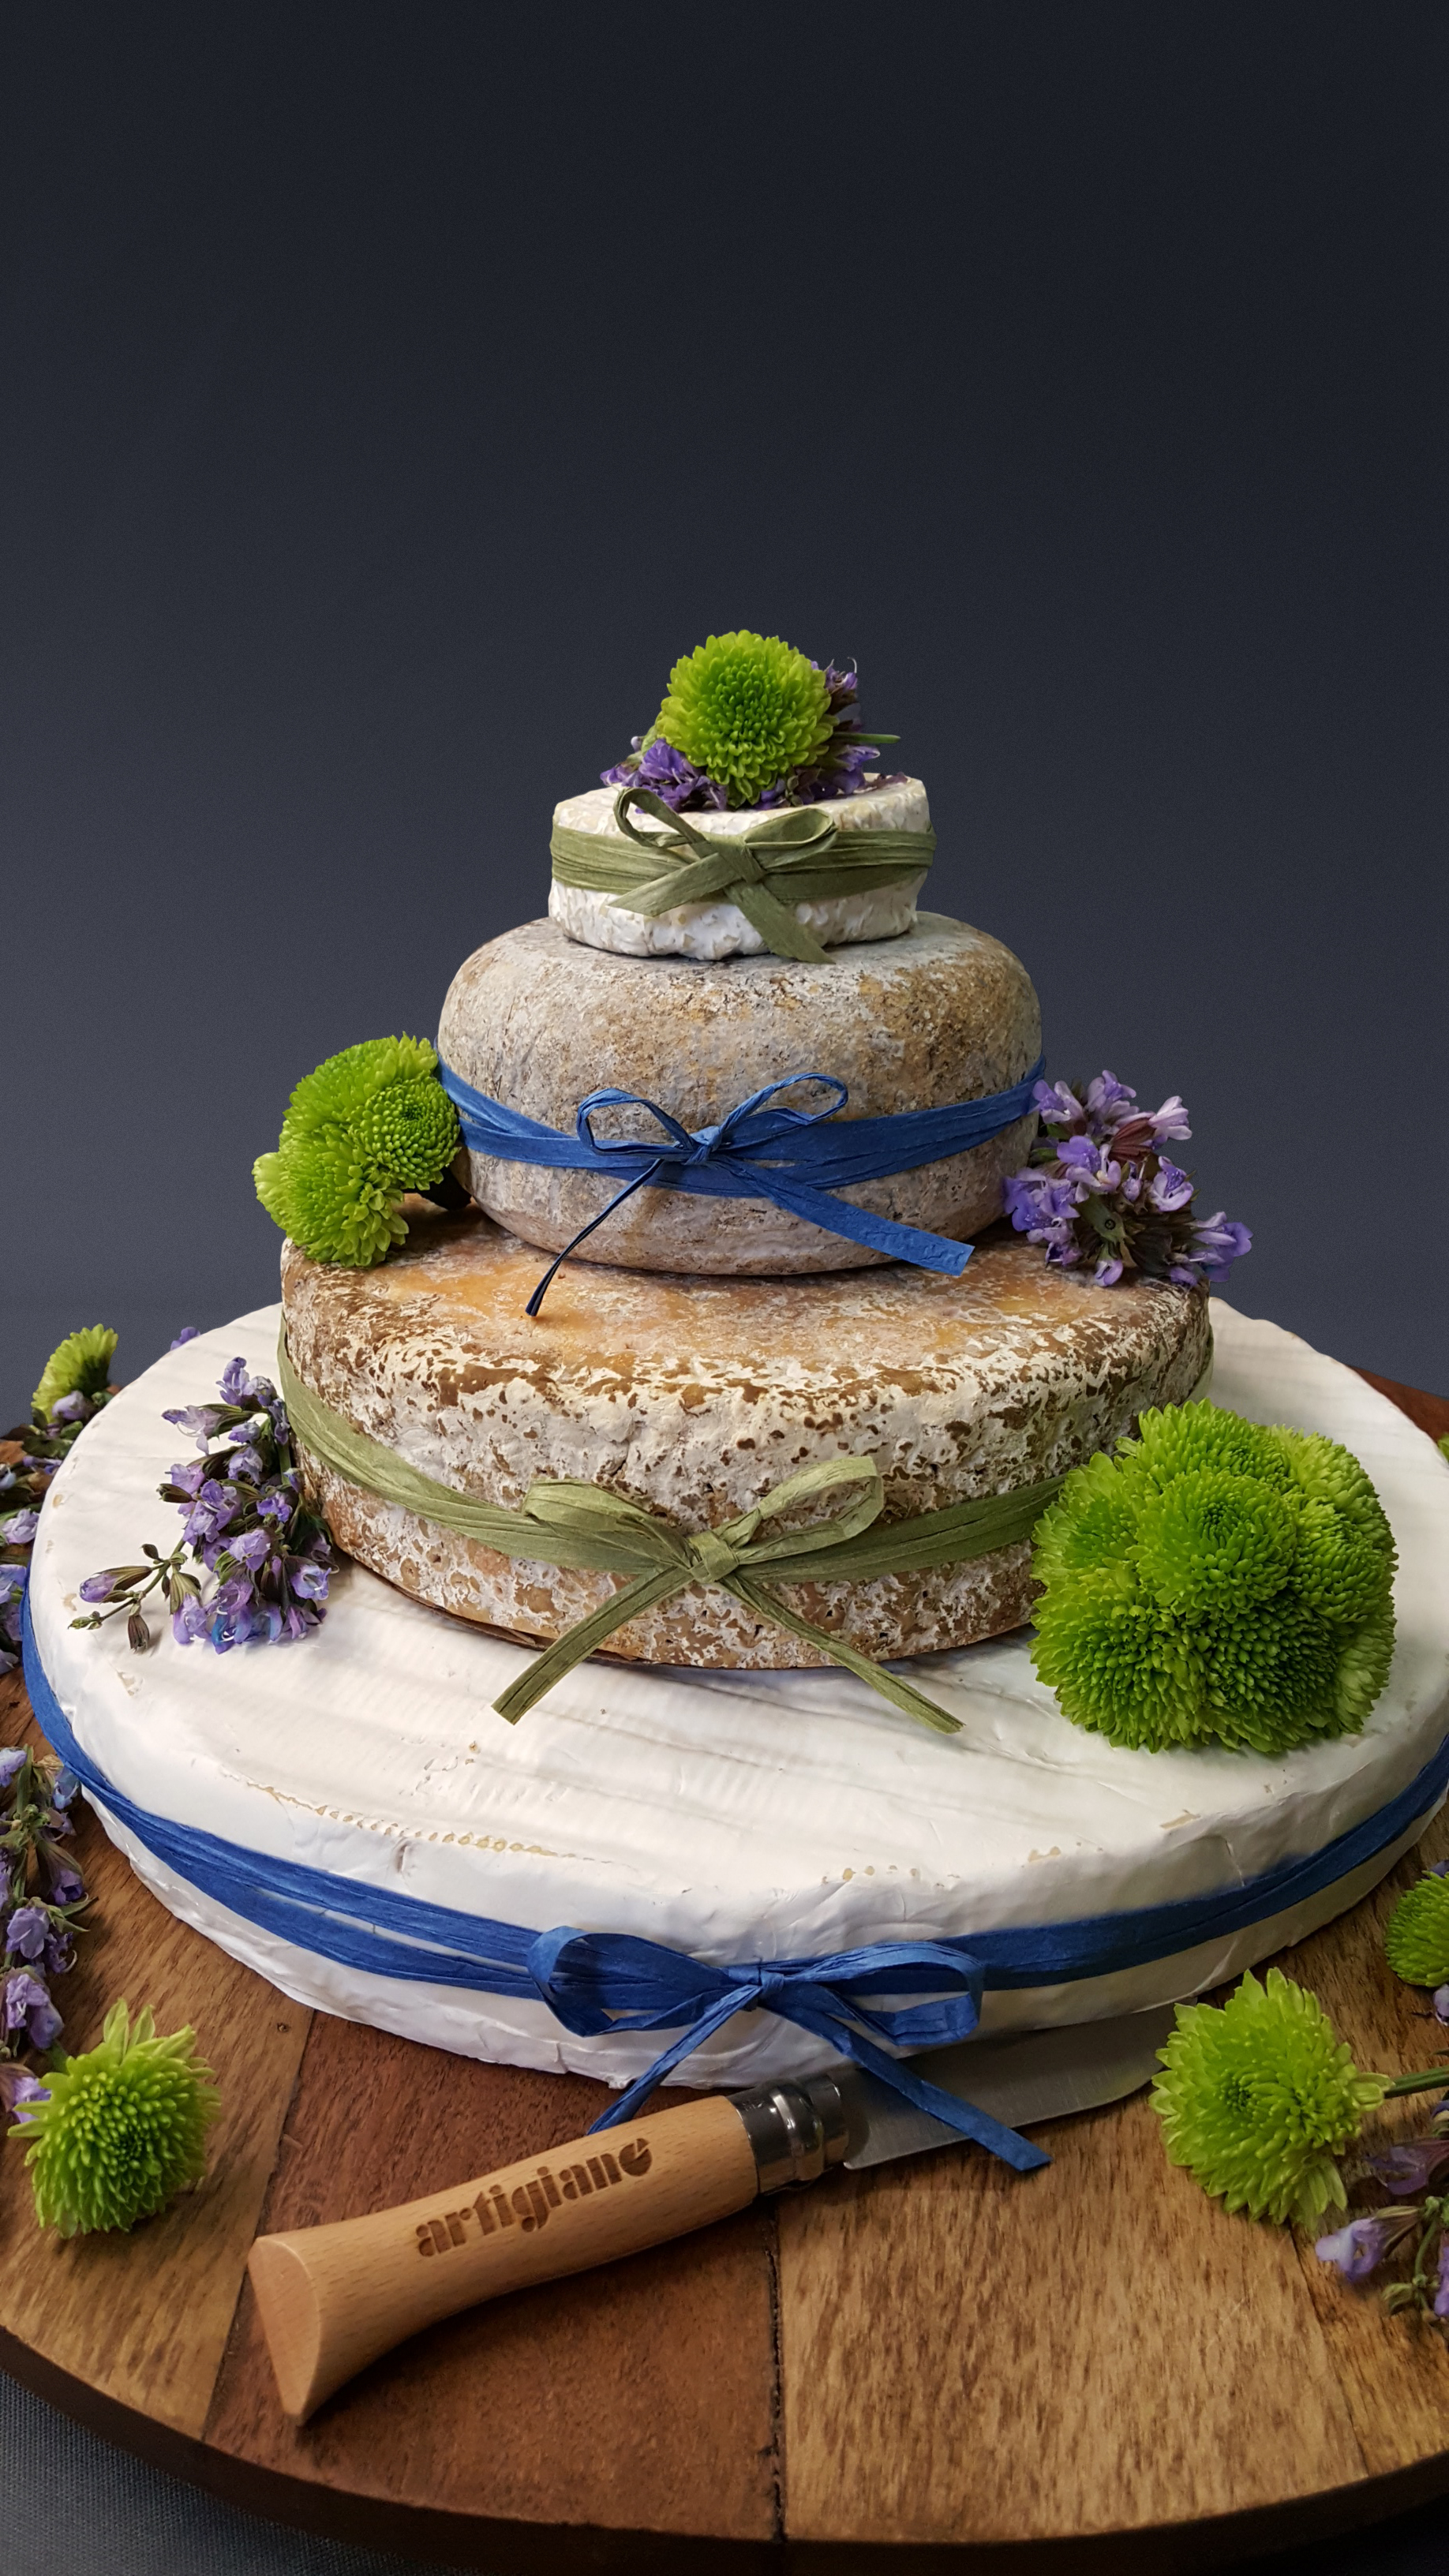 Cheese Cake Background Edit.jpg